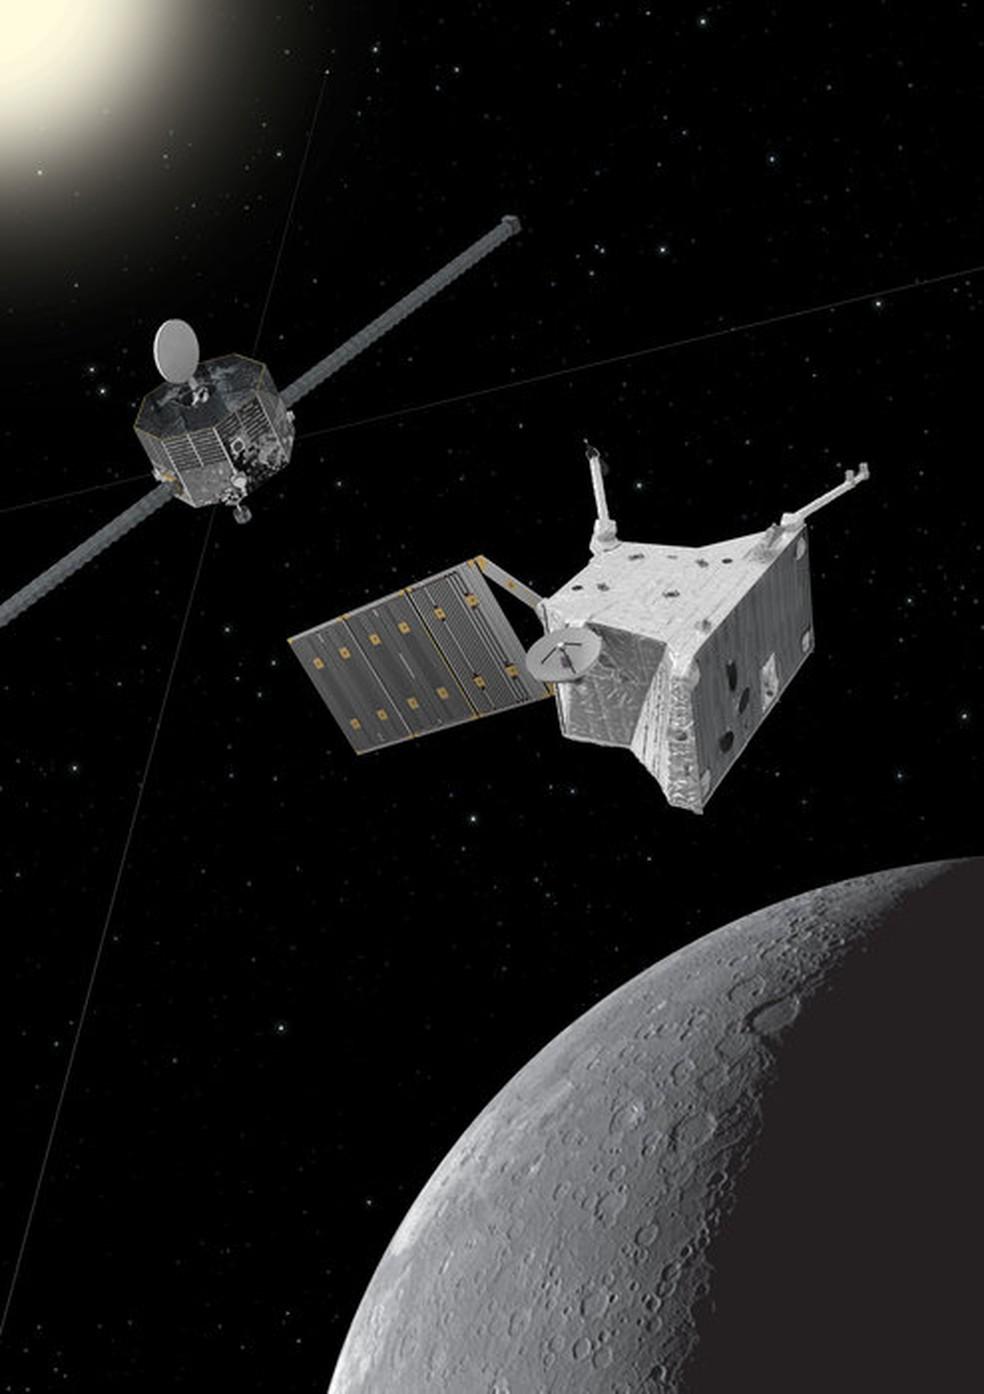 Sonda BepiColombo em Mercúrio — Foto: ESA